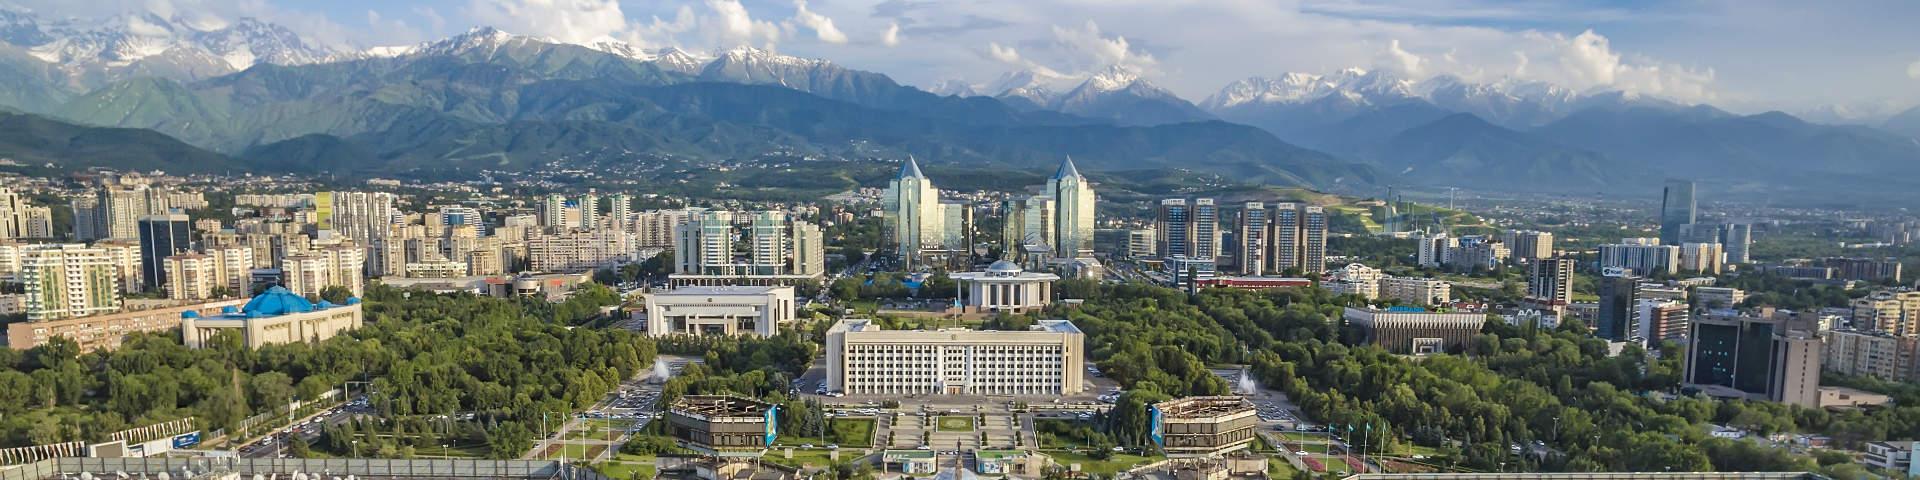 Almaty hero banner 2